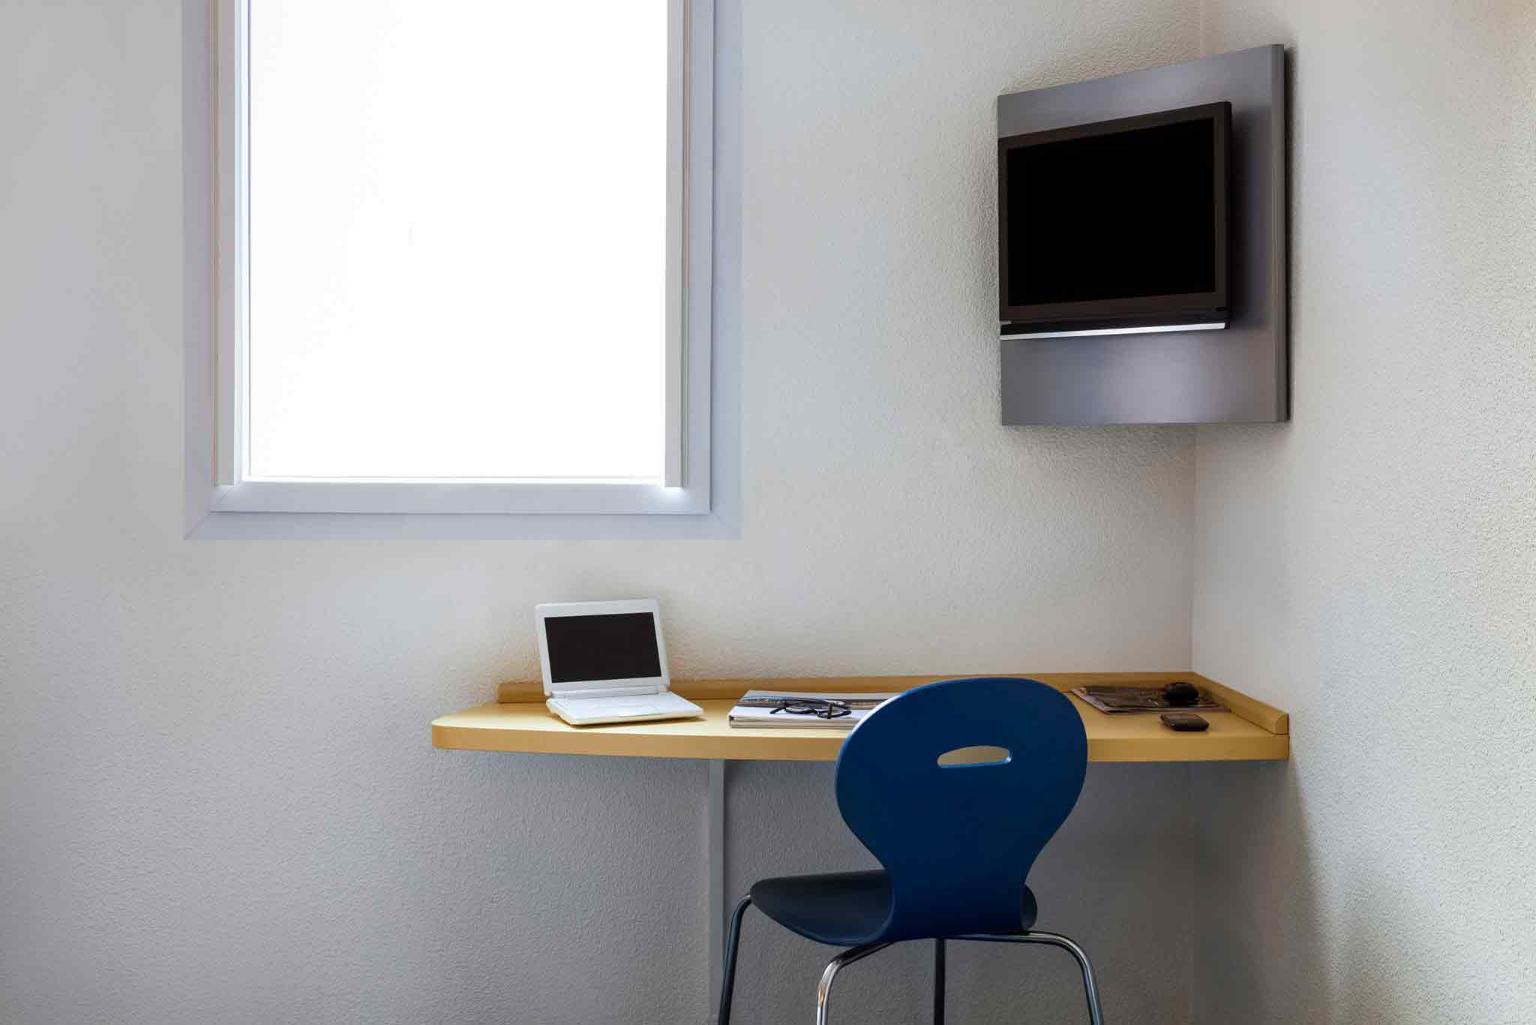 ibis budget albi centre h tel 16 rue castelginest 81000 albi adresse horaire. Black Bedroom Furniture Sets. Home Design Ideas